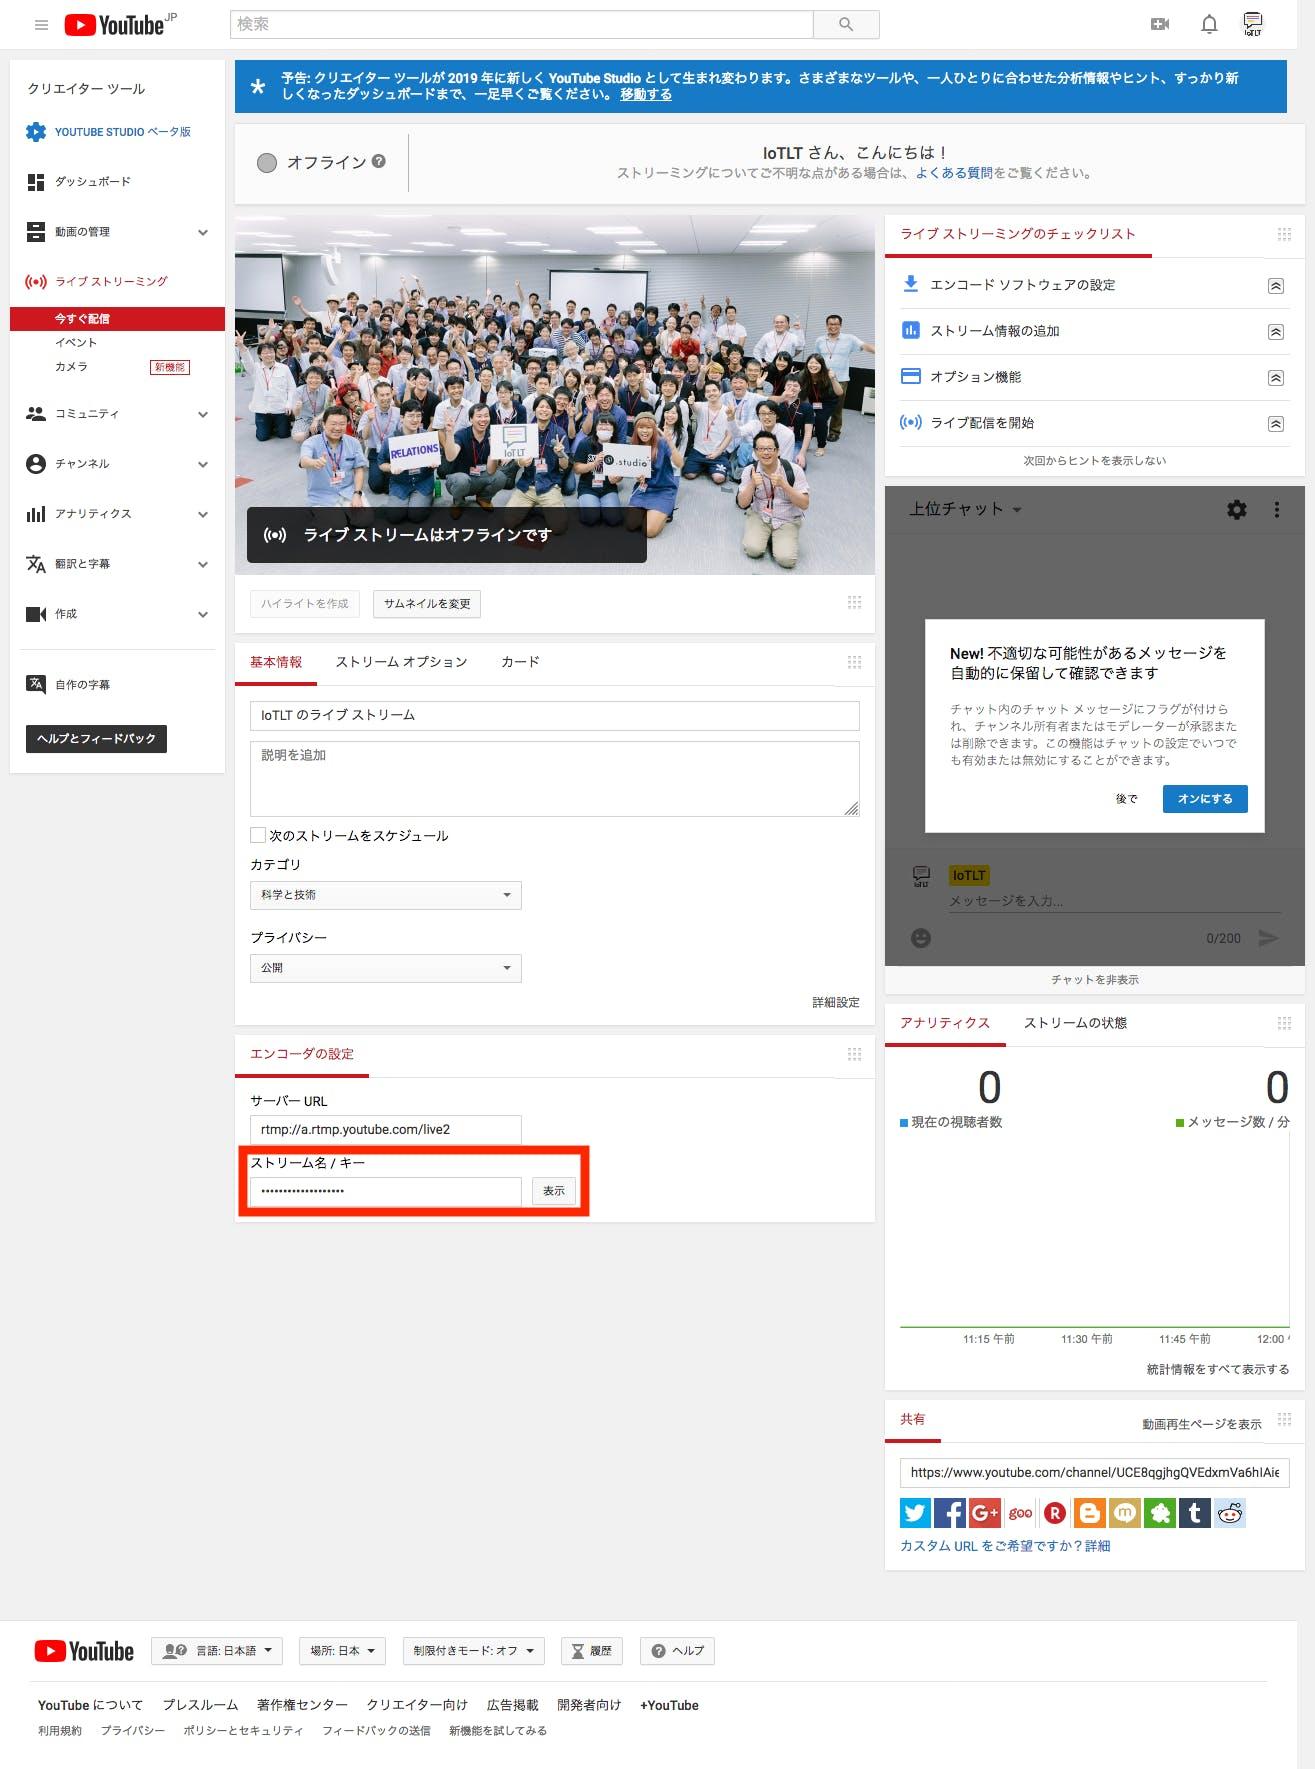 Screenshot_2018-11-26 ライブ ダッシュボード - YouTube.png